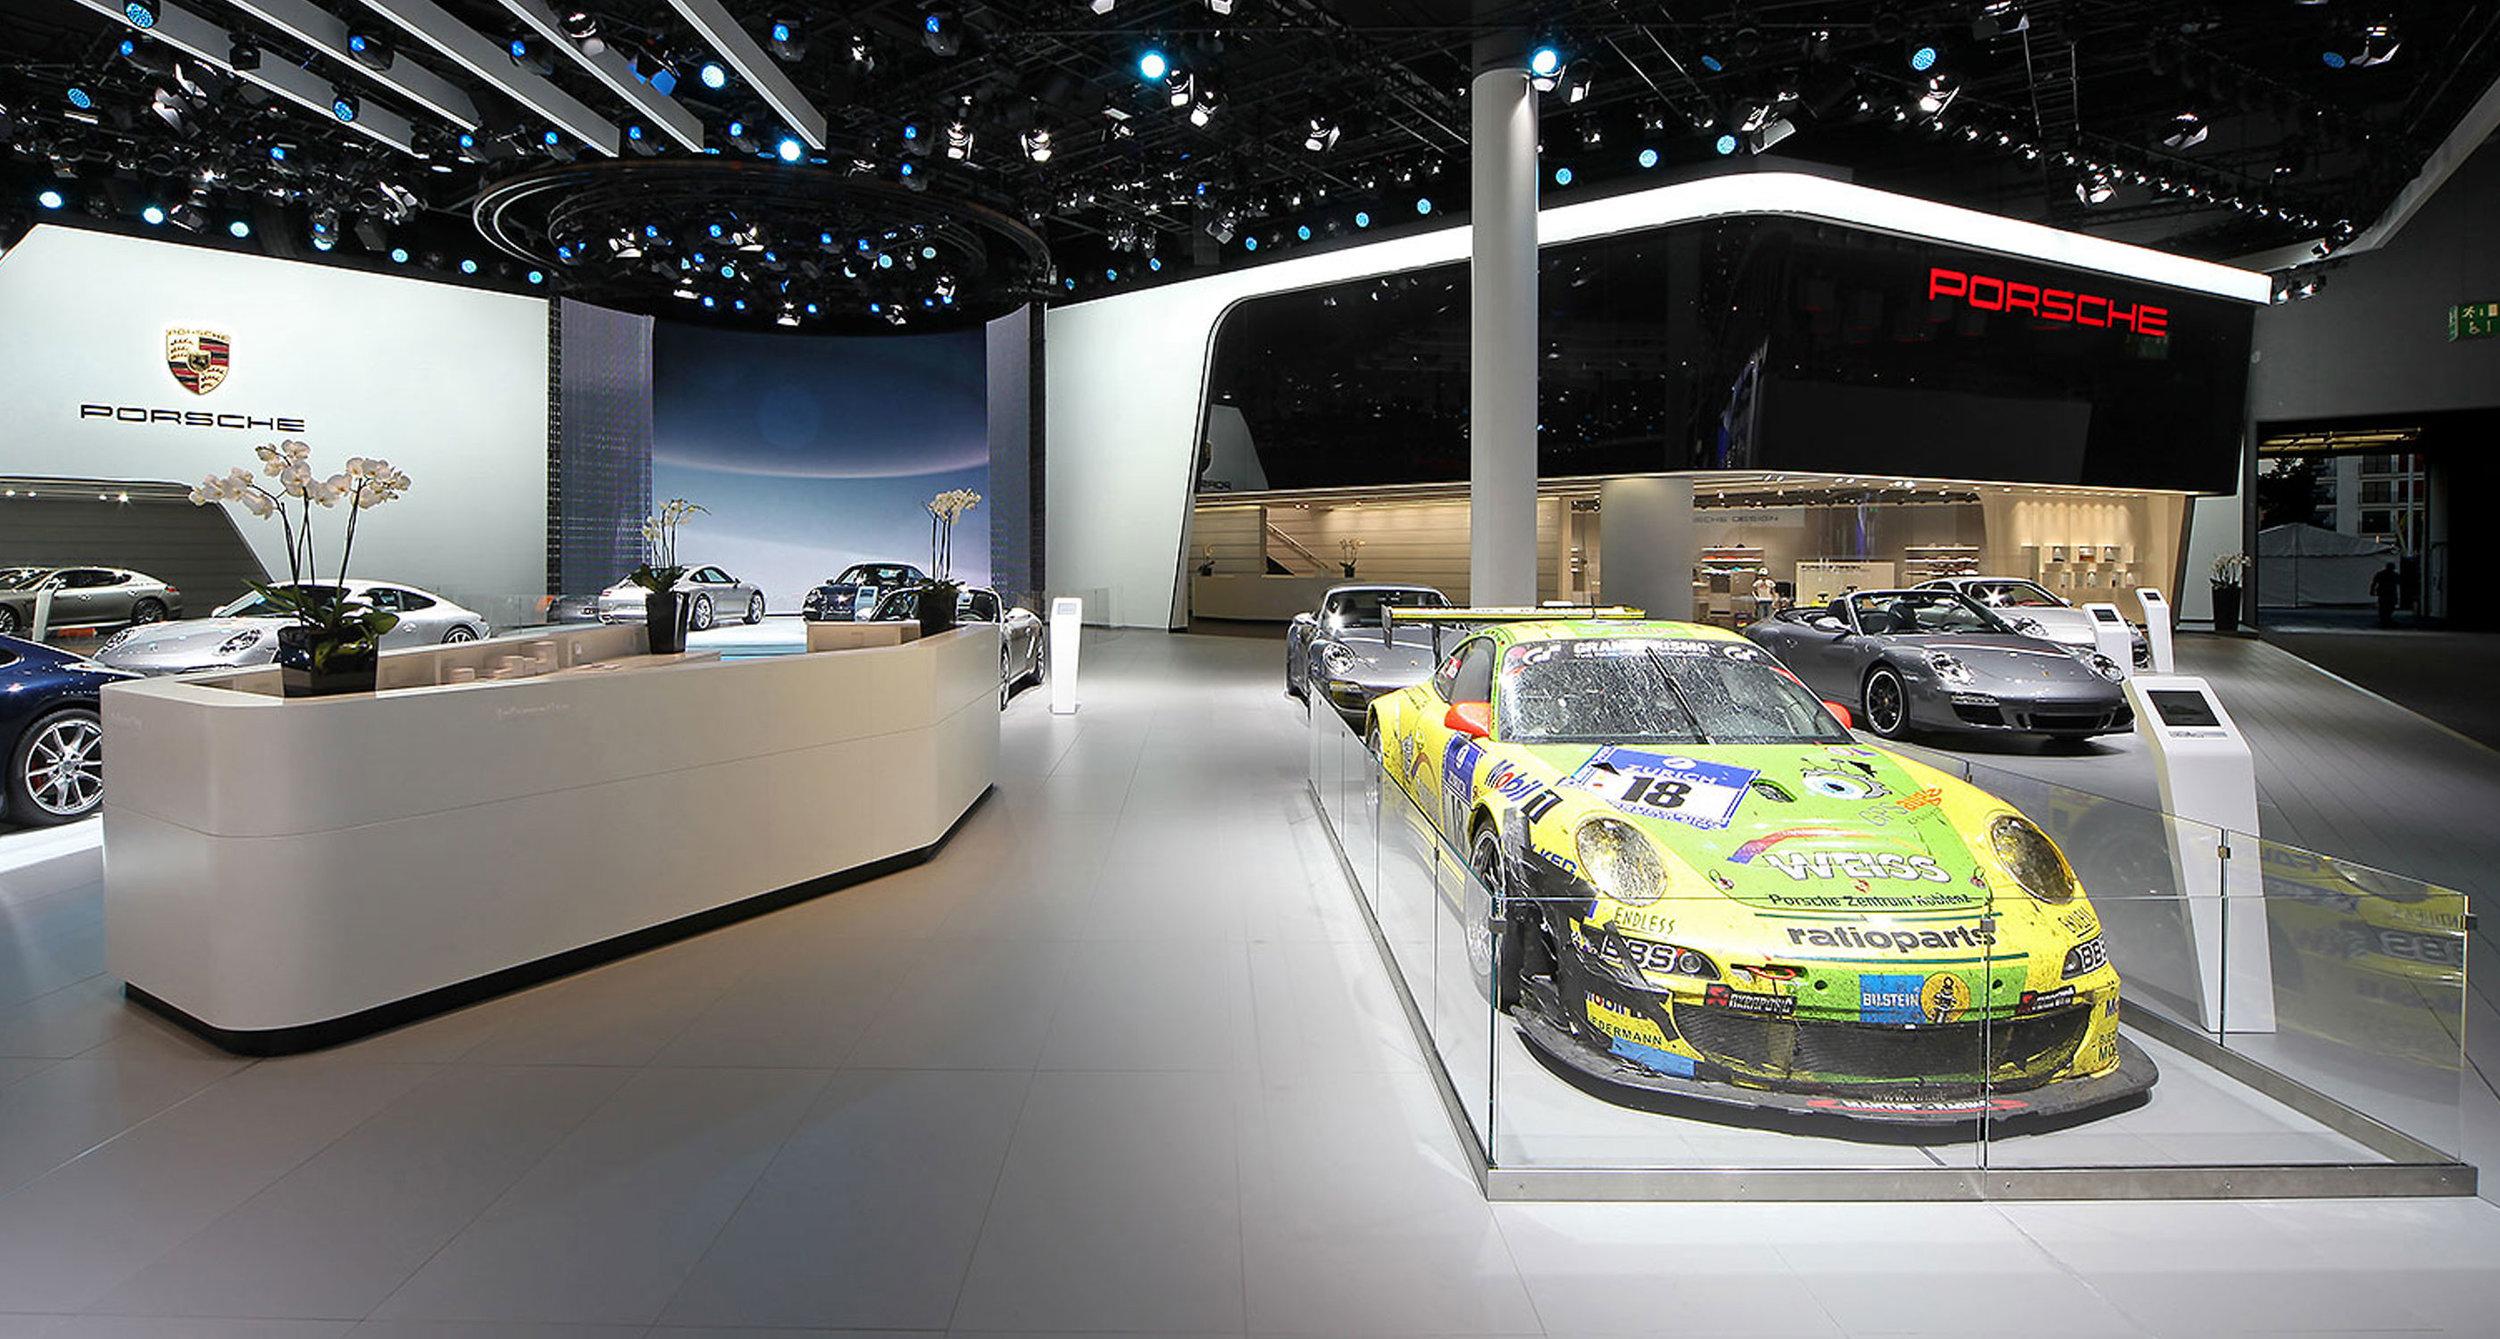 Porsche_IAA_03.jpg